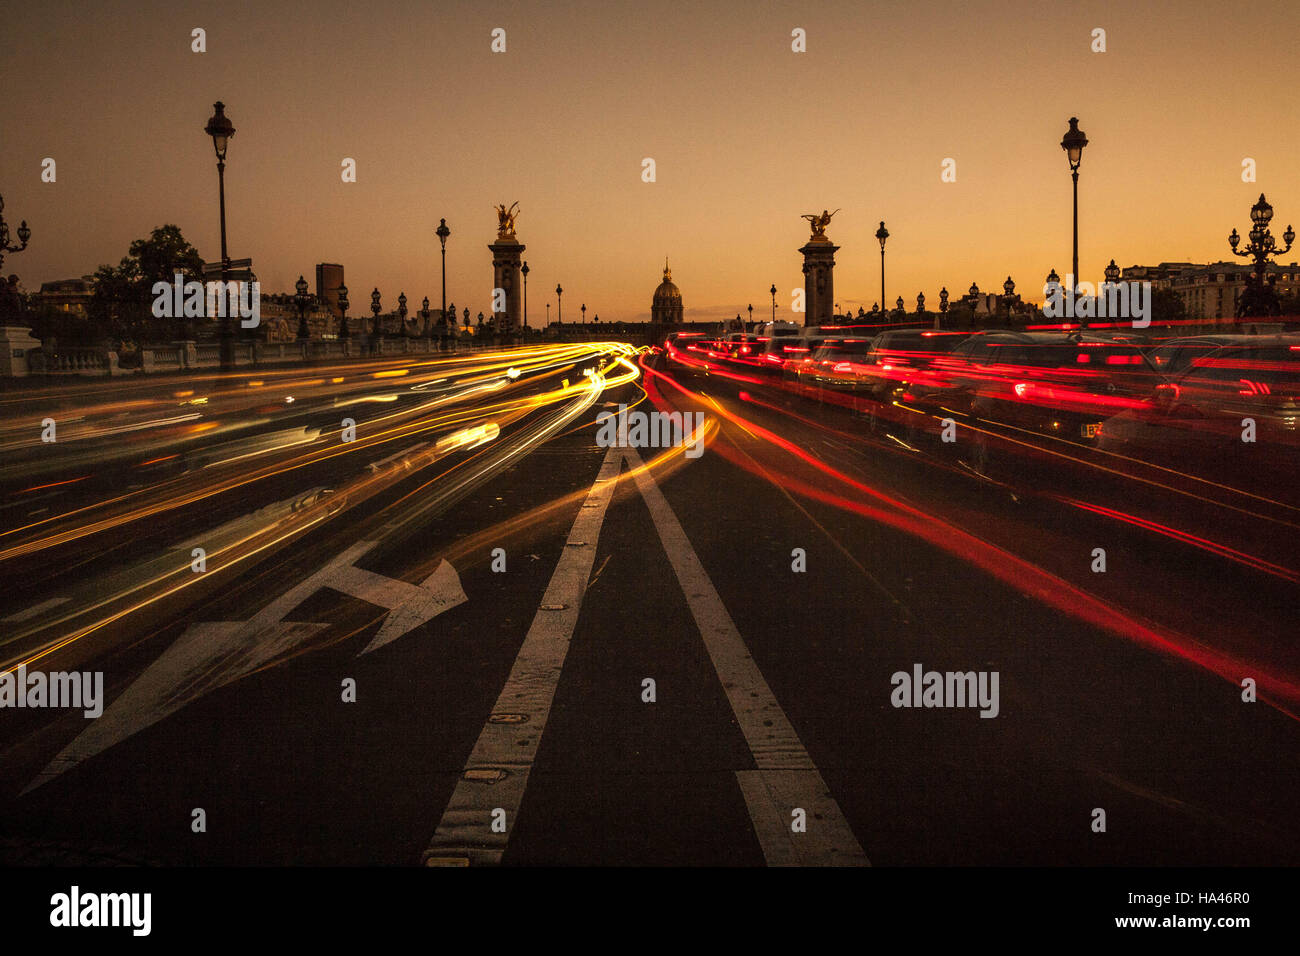 Trafic parisien. Photo Stock